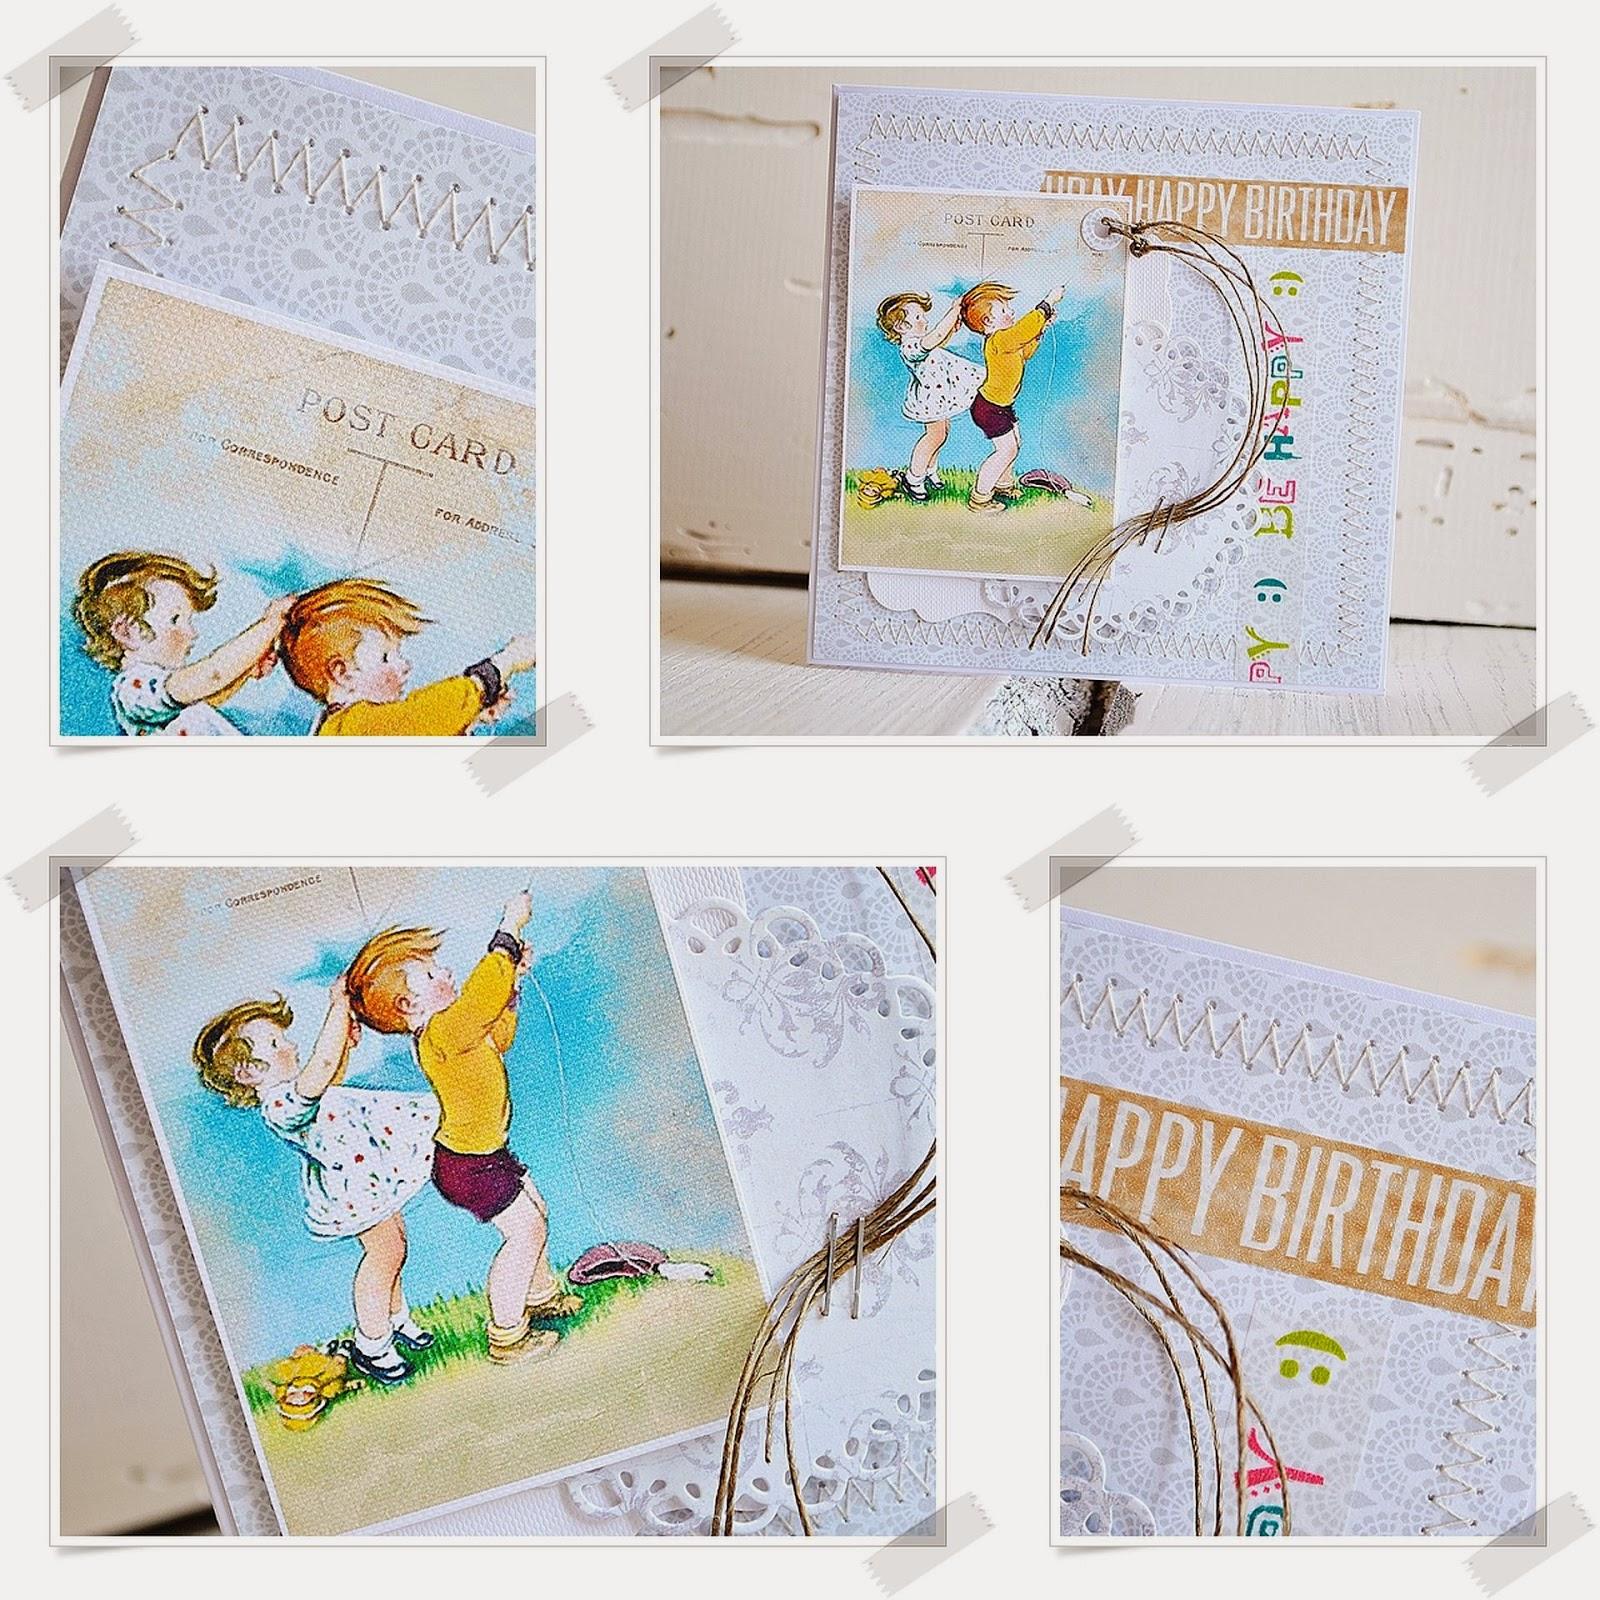 kartka urodzinowa scrapbooking